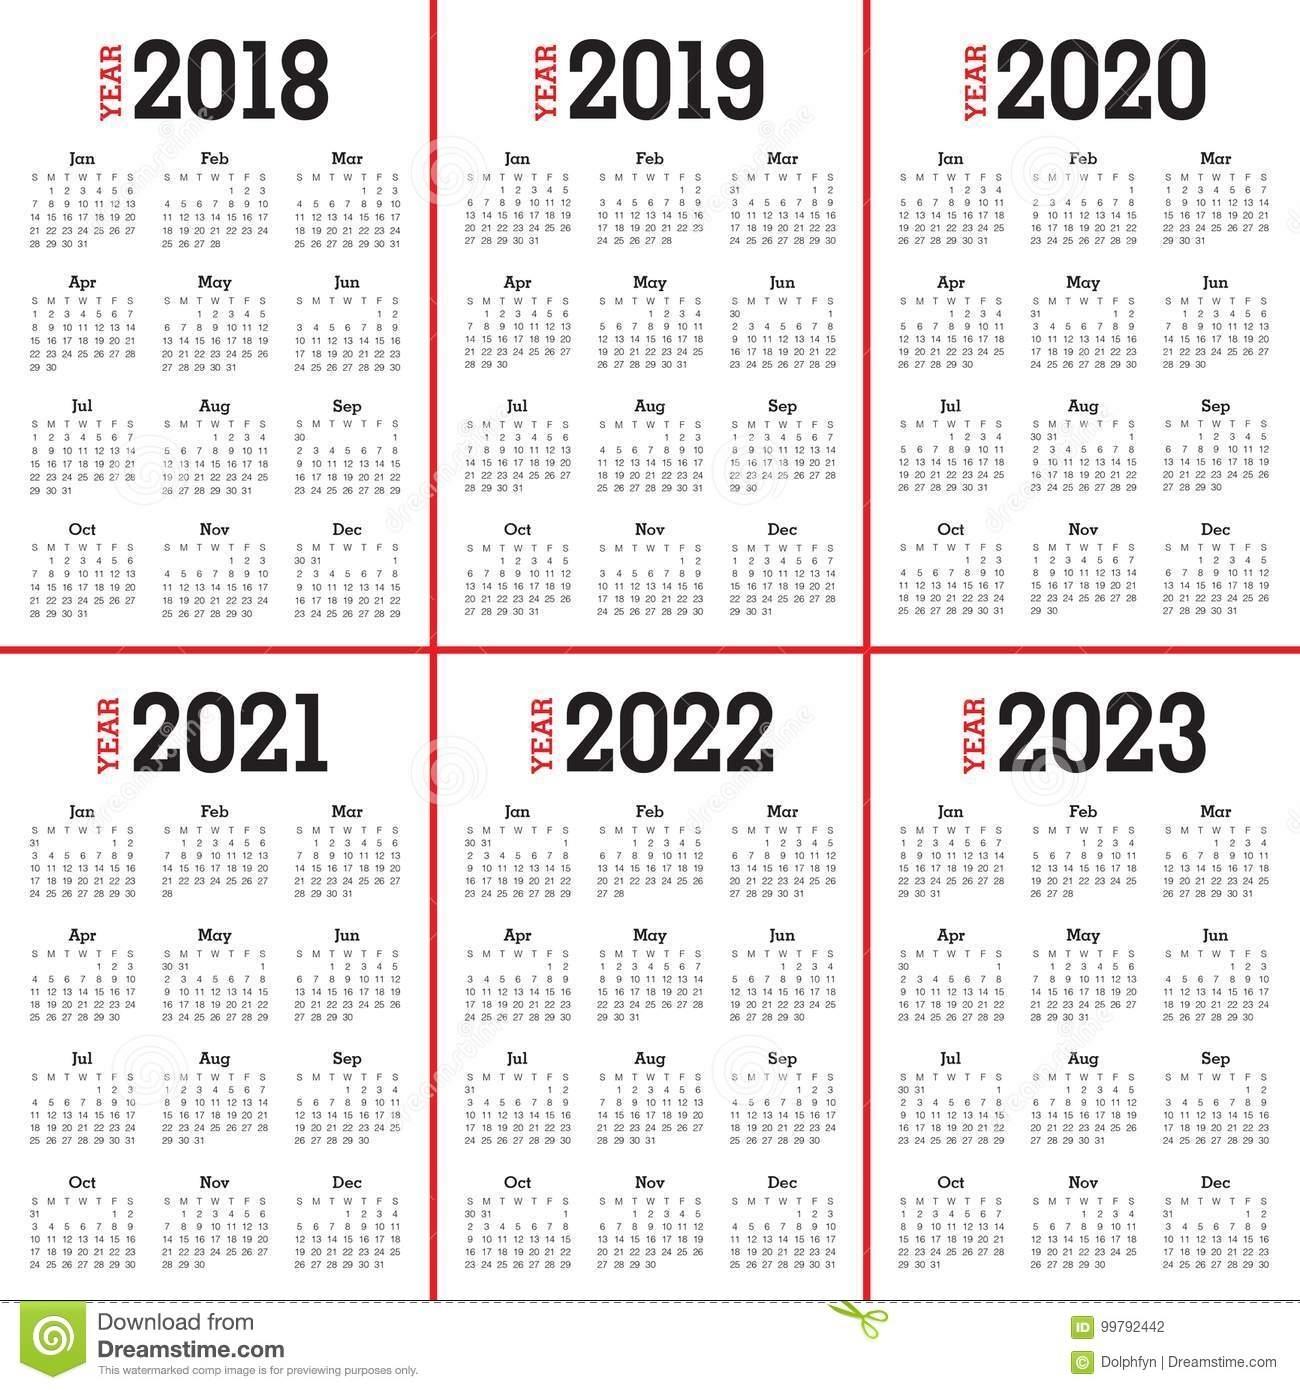 Year 2018 2019 2020 2021 2022 2023 Calendar Vector Stock Vector with regard to 10 Years Calendar From 2020